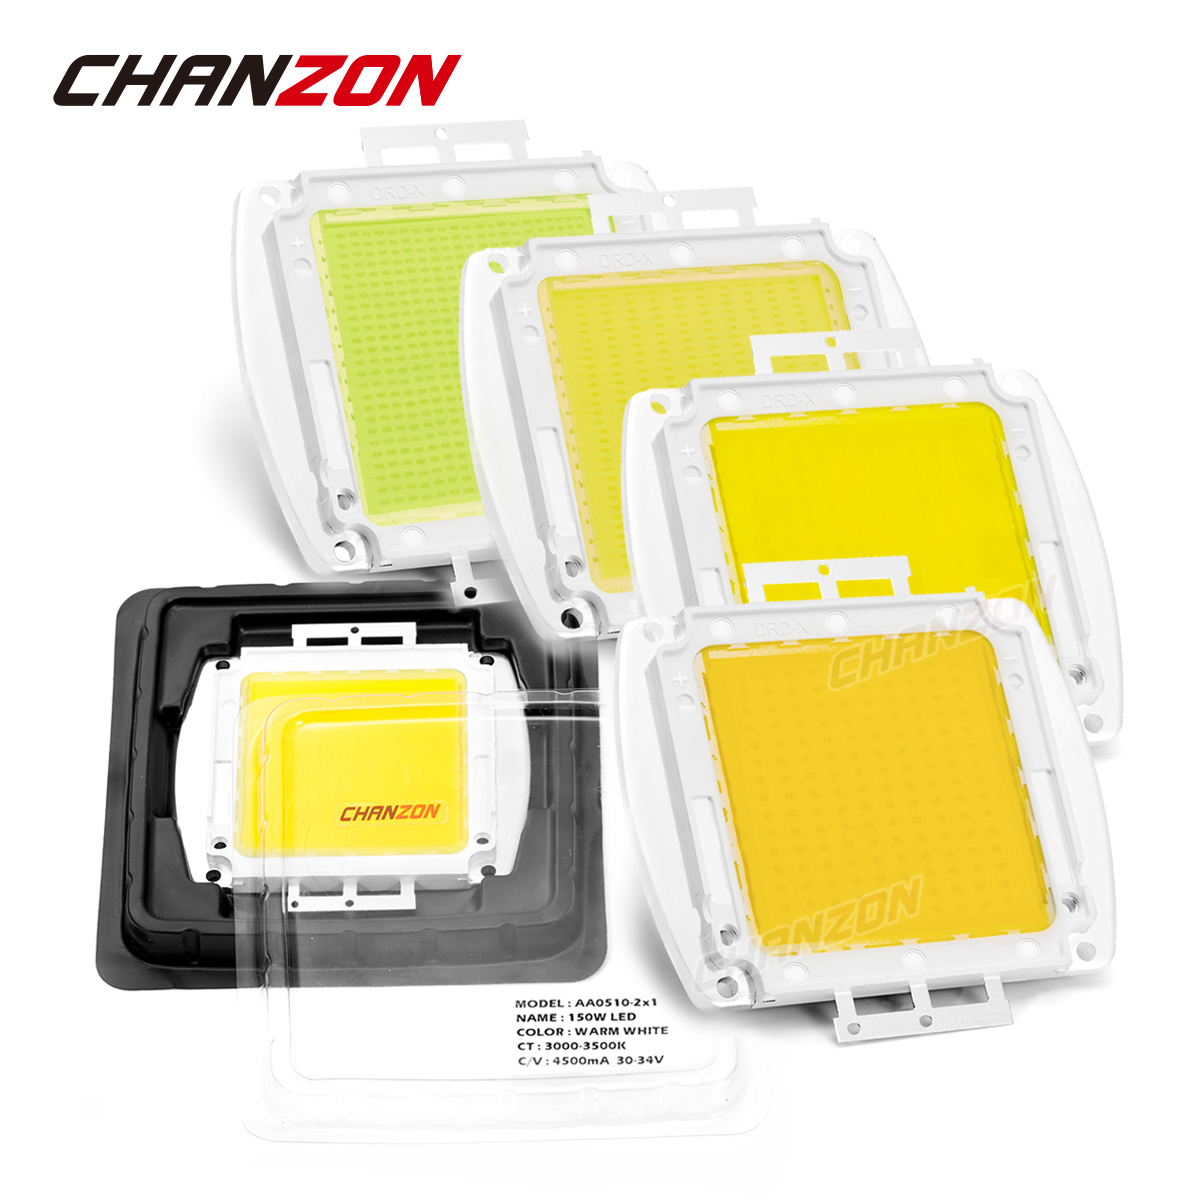 High Power LED SMD COB Birne Chip Matrix 150 watt 200 watt 300 watt 500 watt Natürliche Kühl Warm Weiß 150 200 300 500 watt Watt für Outdoor Licht